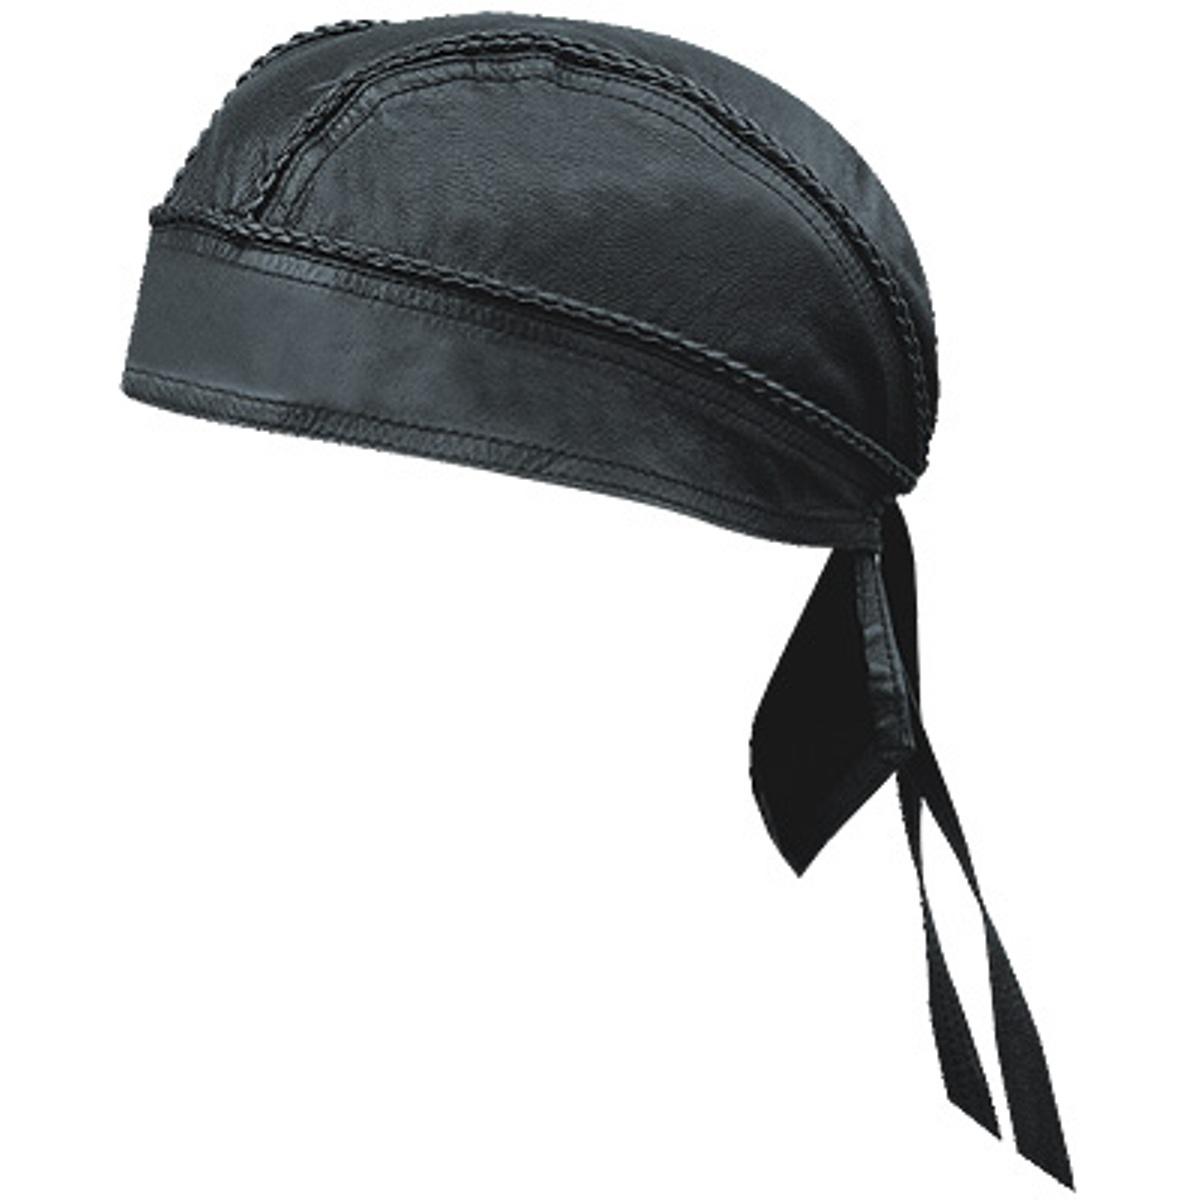 303d9d2bcc Hmb-901a4 Leather Skull Cap Black Braids Bandana Durag Hats Biker Choice -  Buy Leather Caps,Bandana Hats,Leather Skullcap Product on Alibaba.com